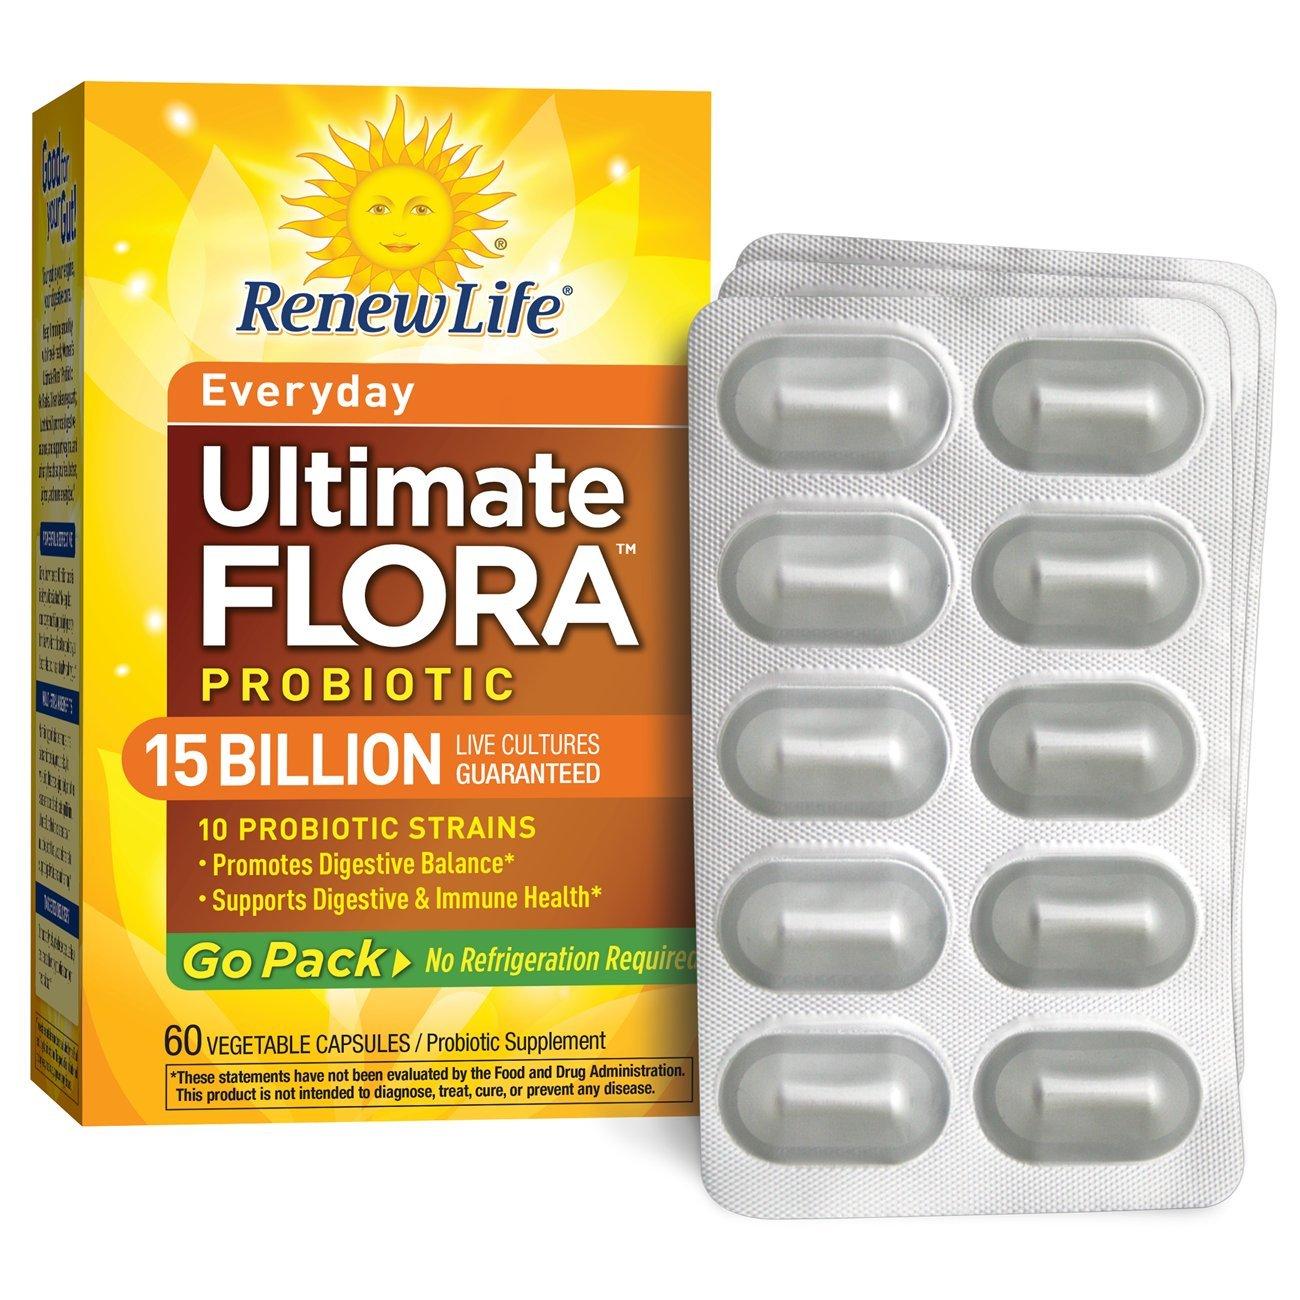 Renew Life - Ultimate Flora Probiotic Everyday - 15 billion - 60 vegetable capsules - Go Pack